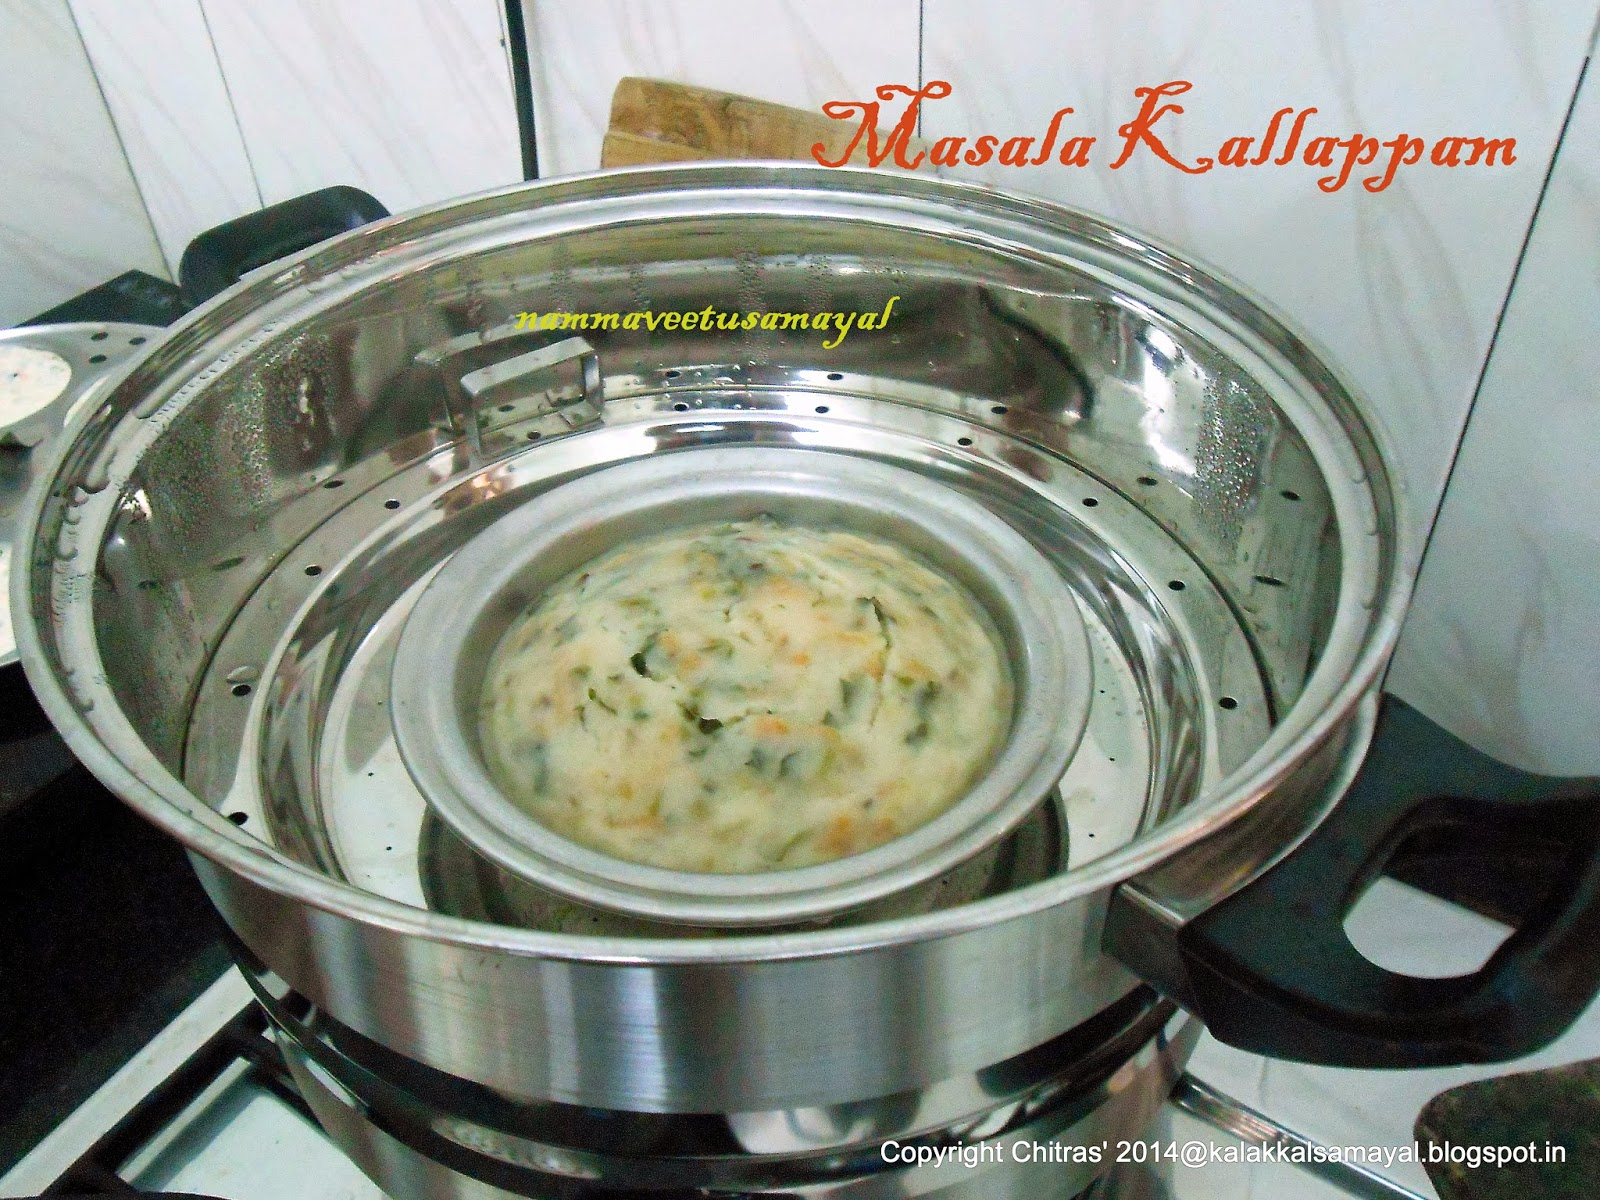 Spicy Masala Kallappam